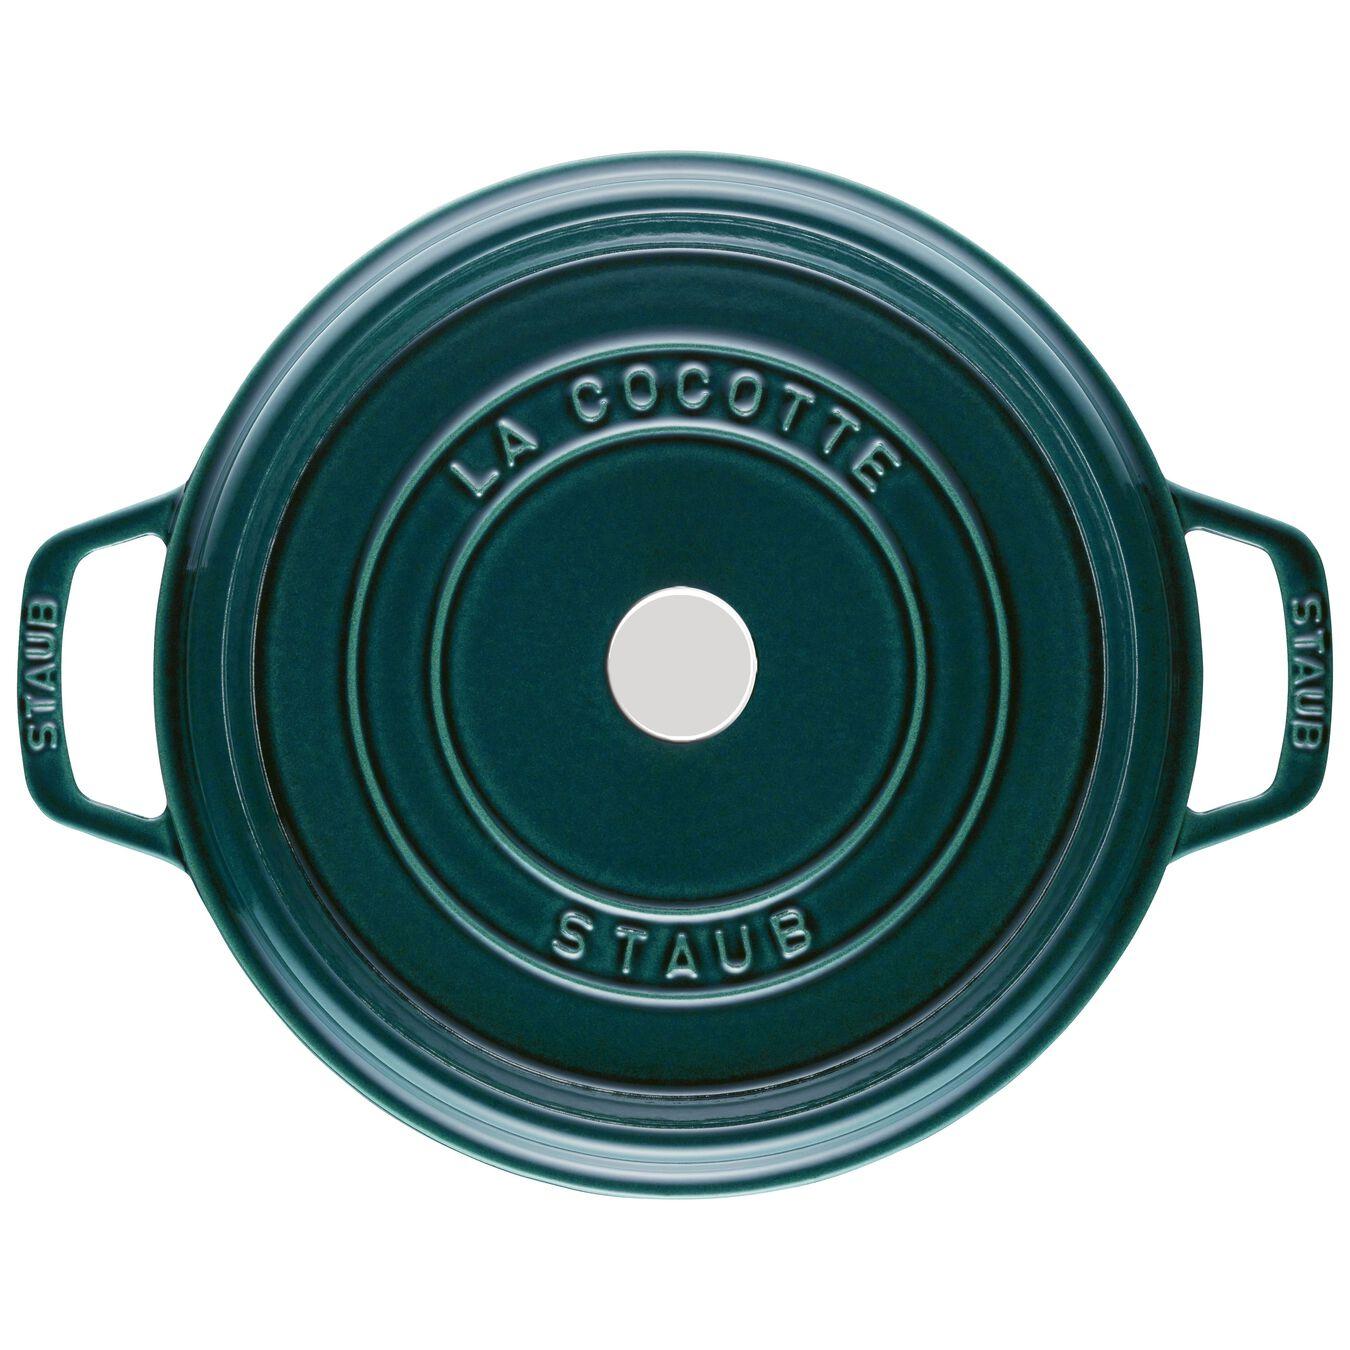 Cocotte 28 cm, rund, La-Mer, Gusseisen,,large 3